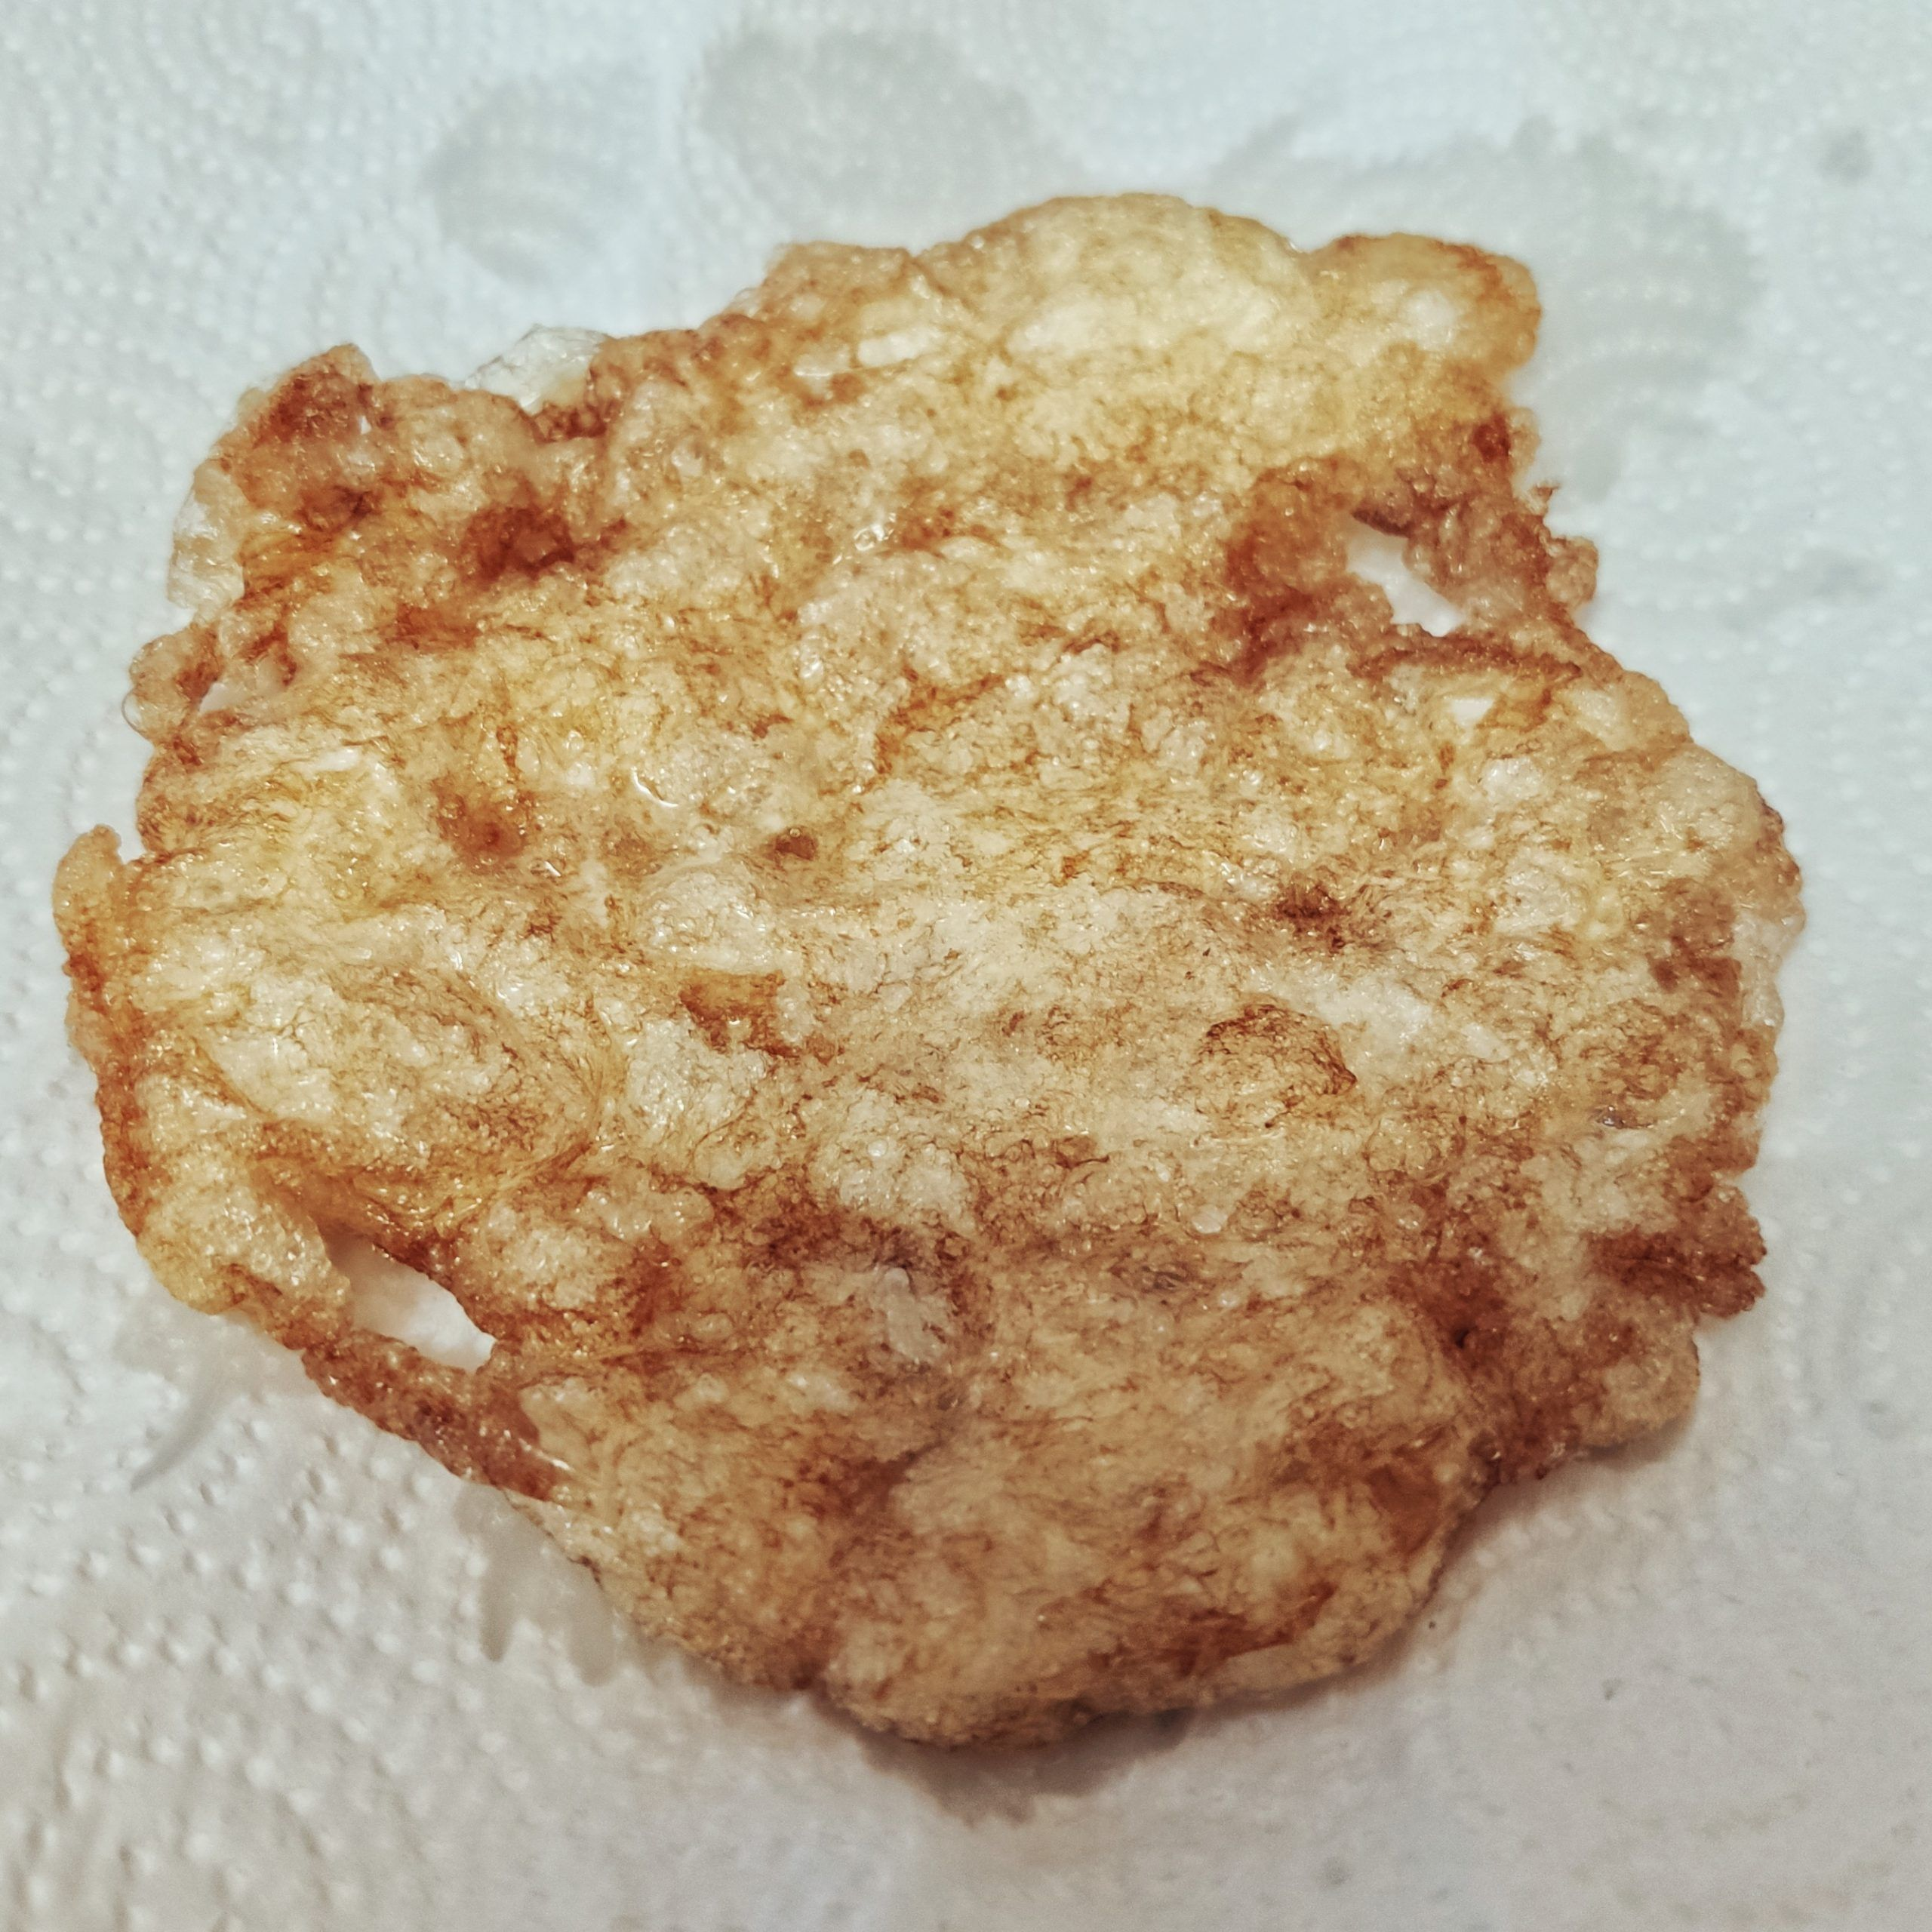 Clara de huevo frita